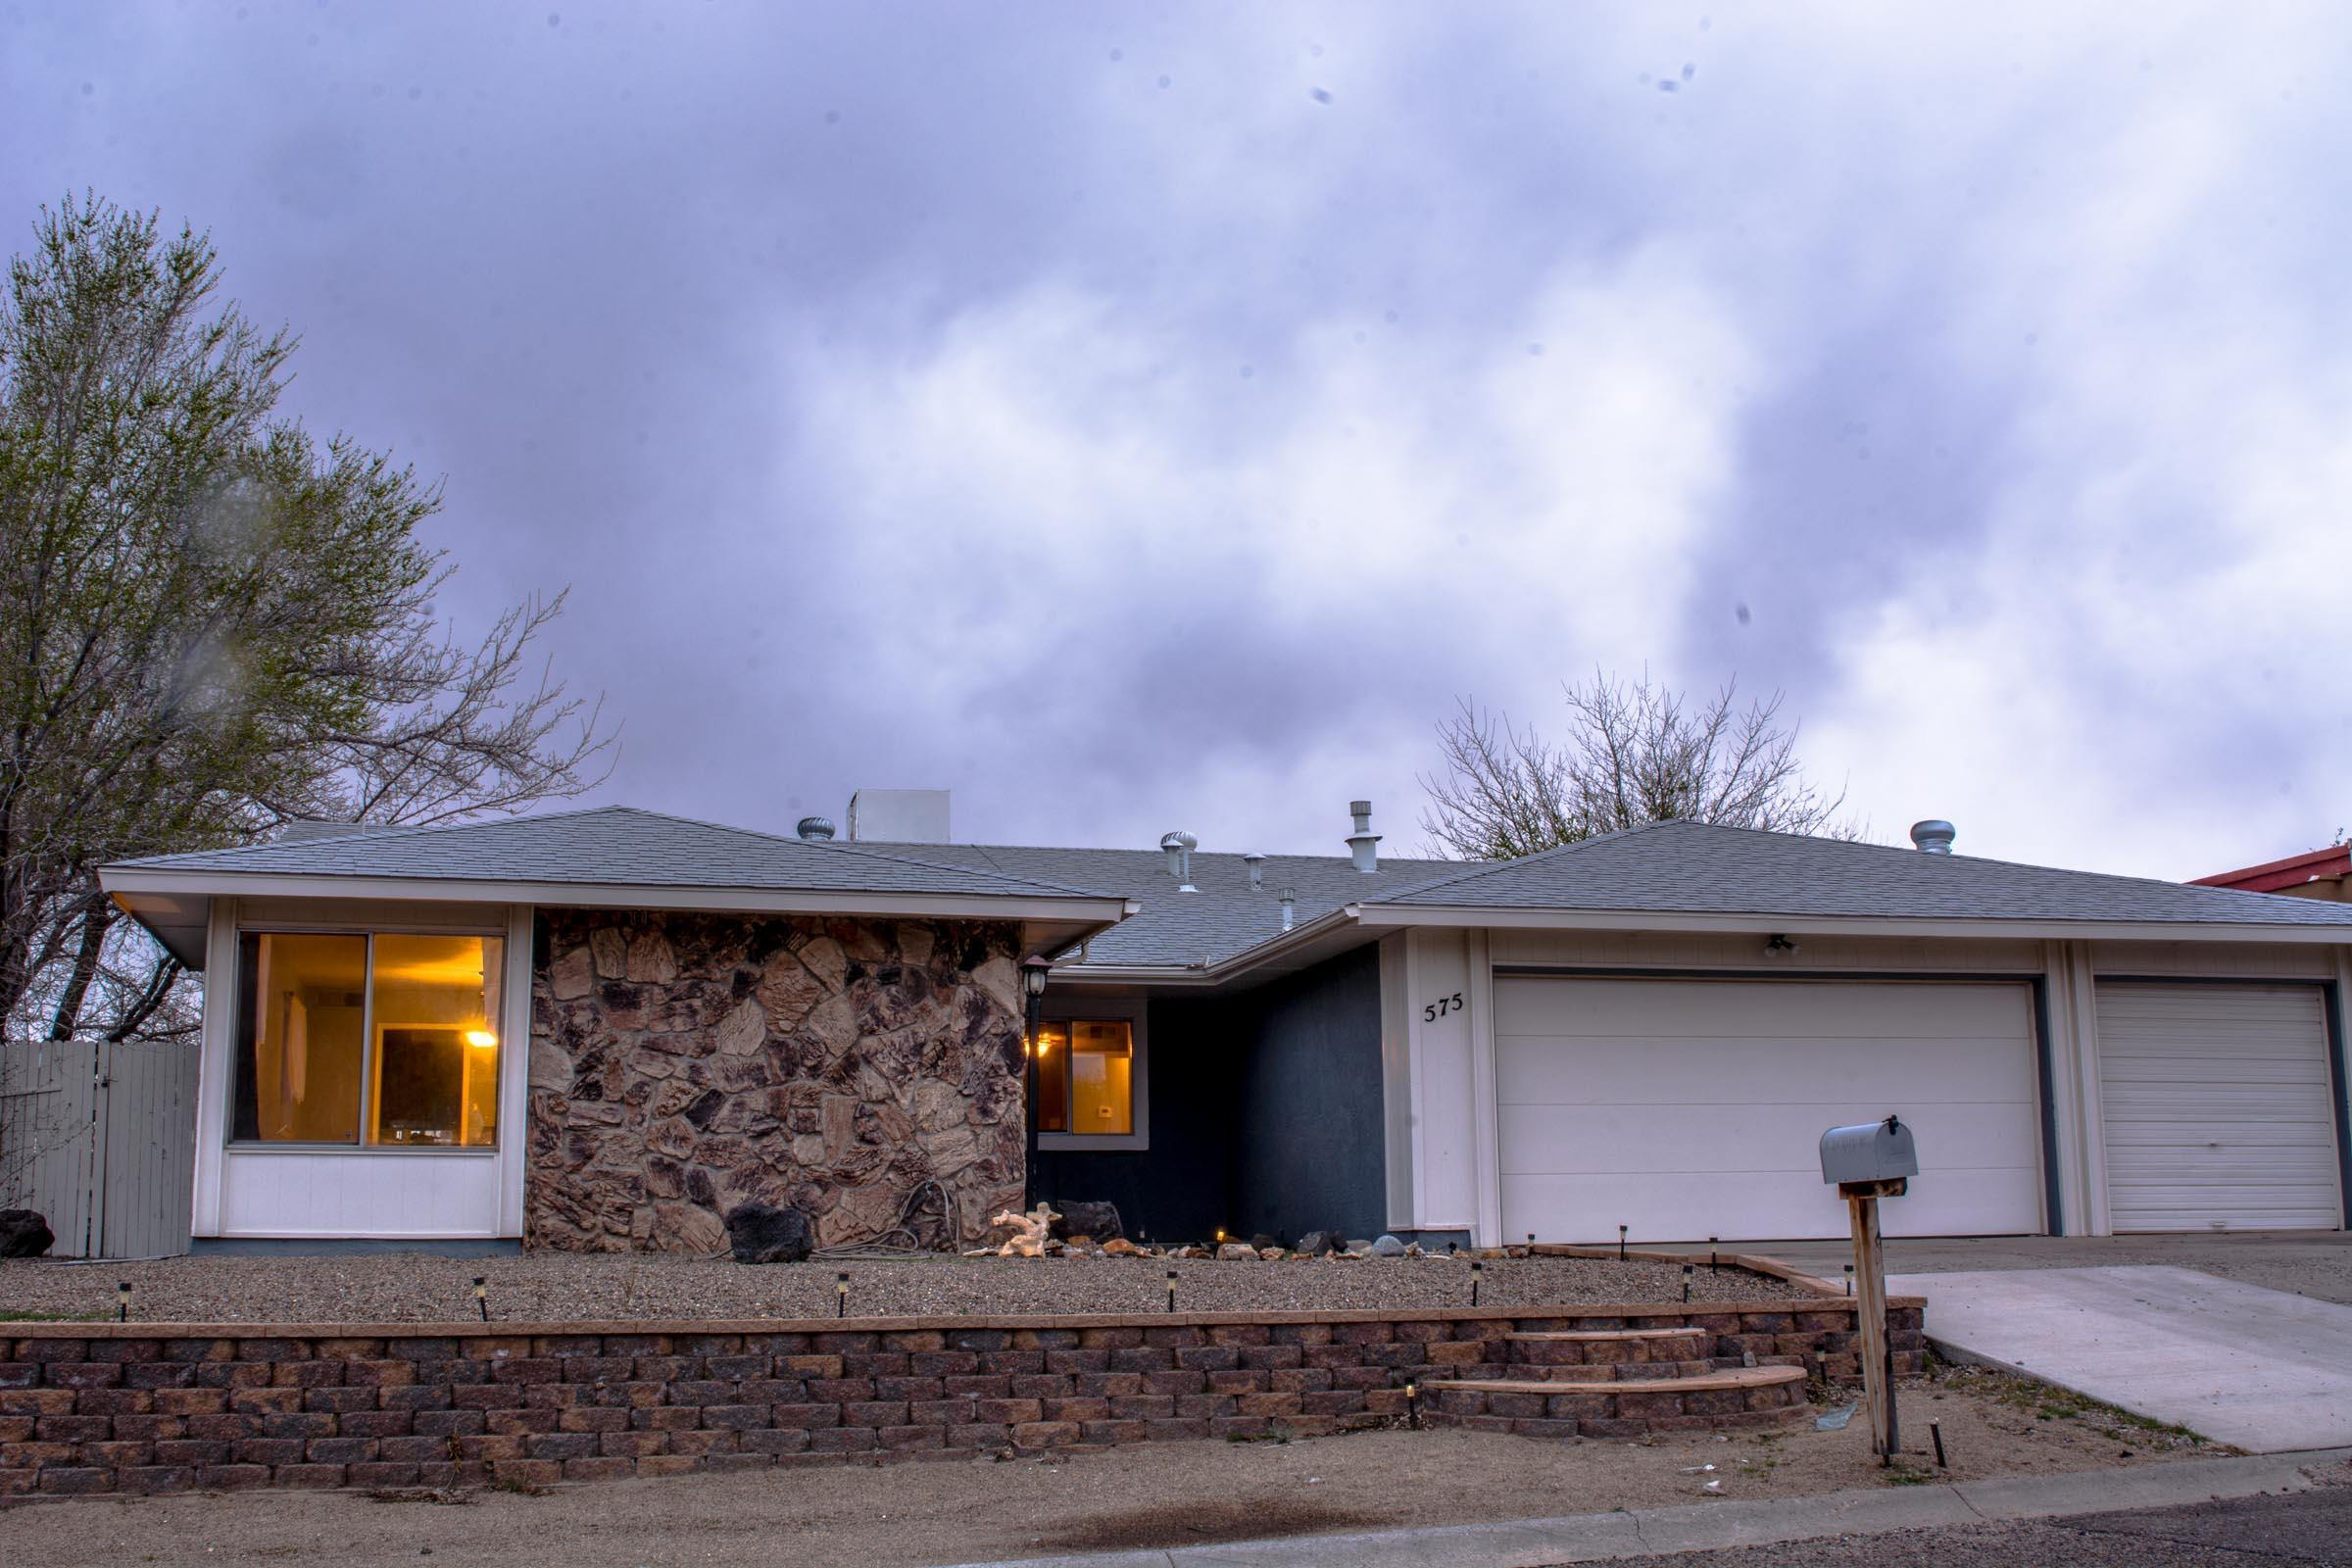 575 SILVER SADDLE Road SE, Rio Rancho, NM 87124 - Rio Rancho, NM real estate listing